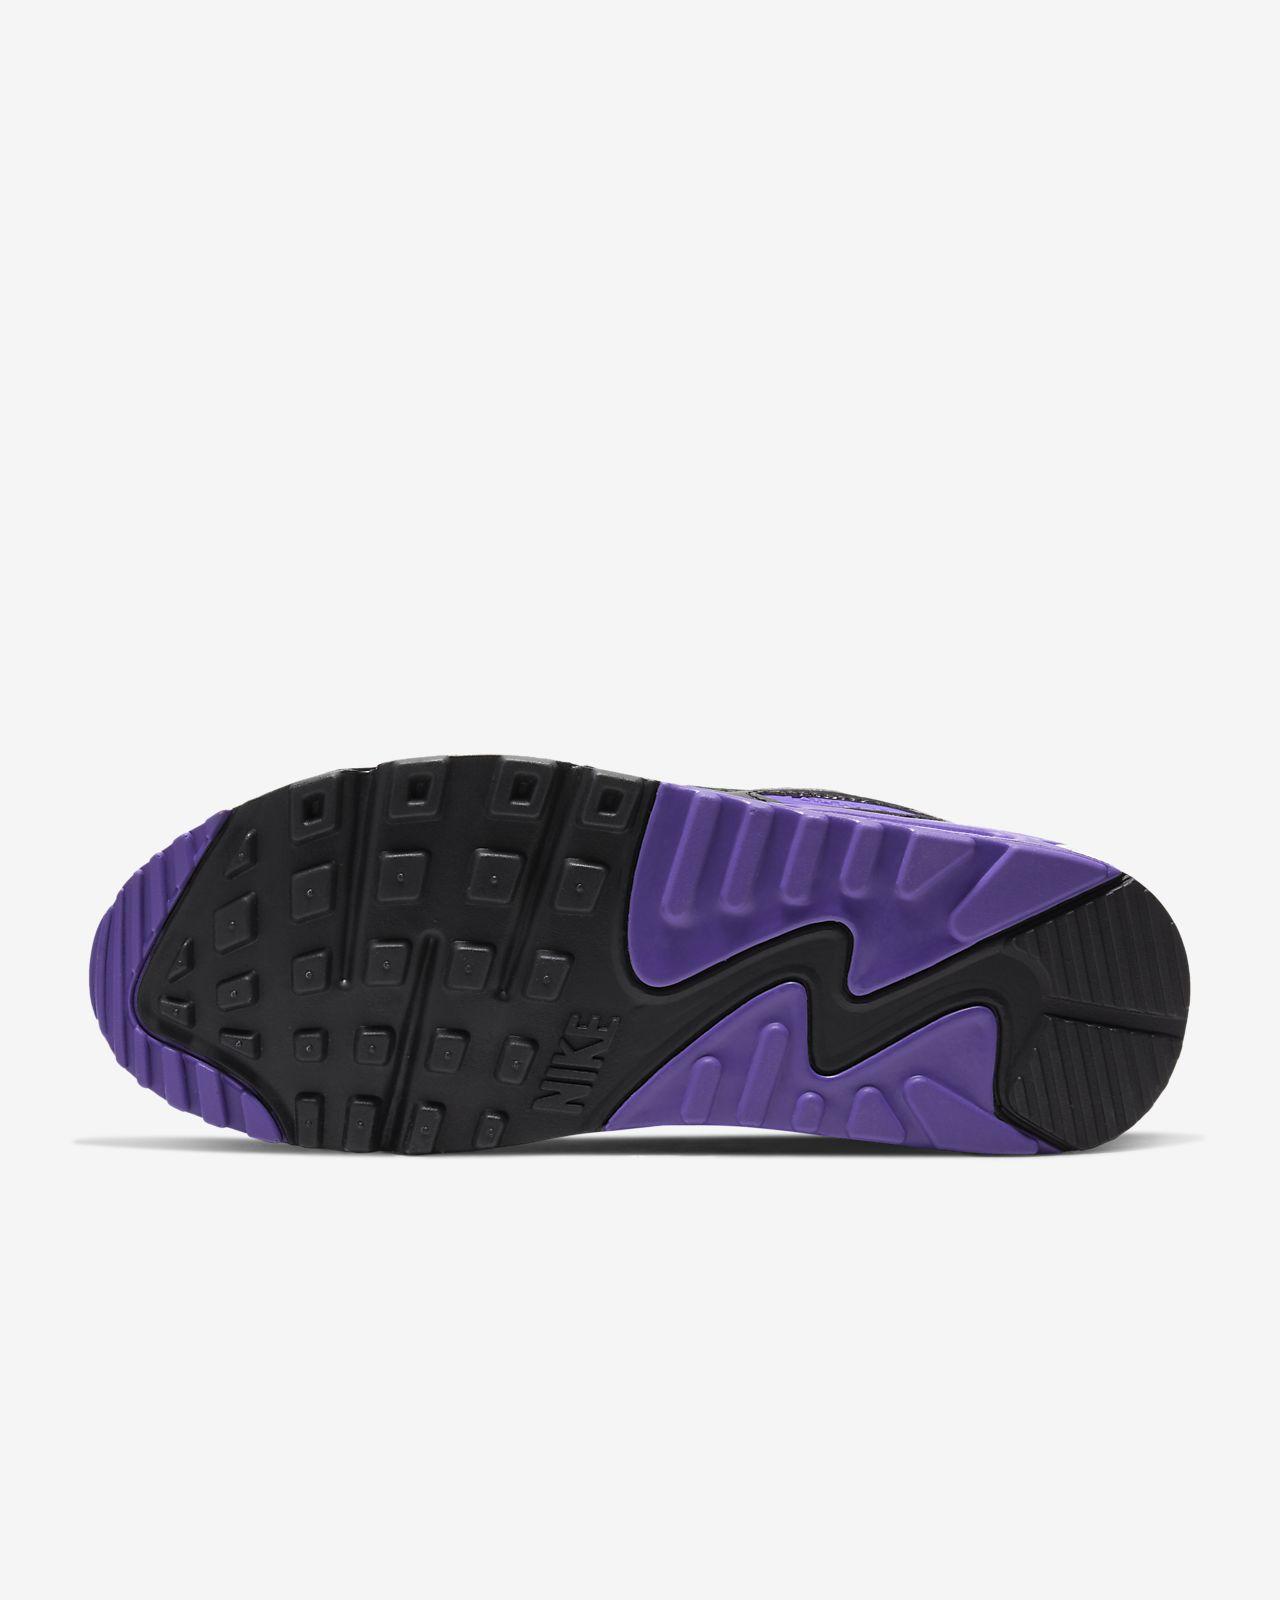 Your ID Store Air Max 90 OG Hyper Grape O Nike Air